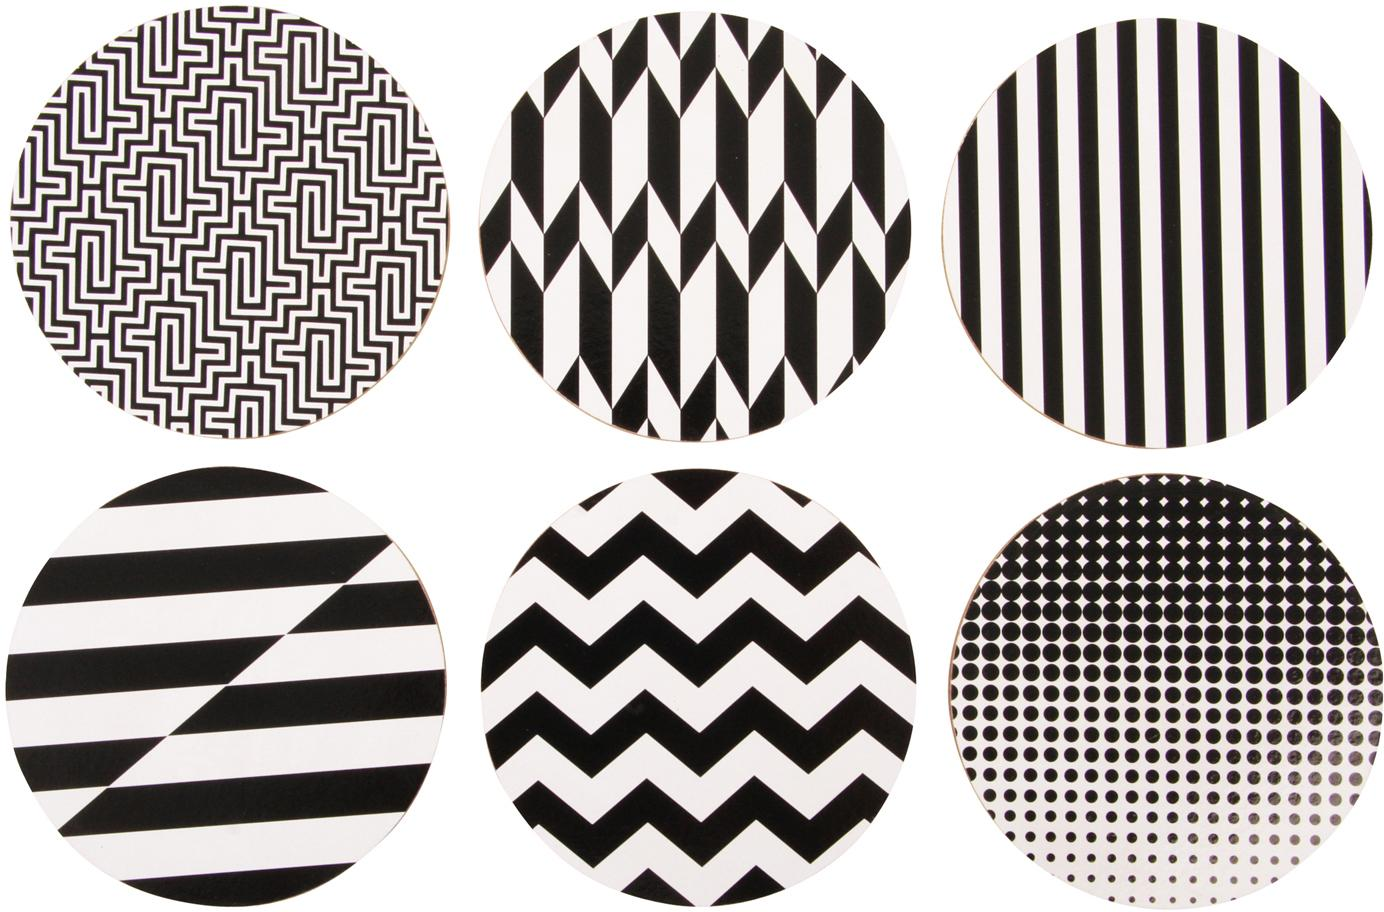 Set sottobicchieri Black and White, 6 pz., Sughero, rivestito, Nero, bianco, Ø 10 cm